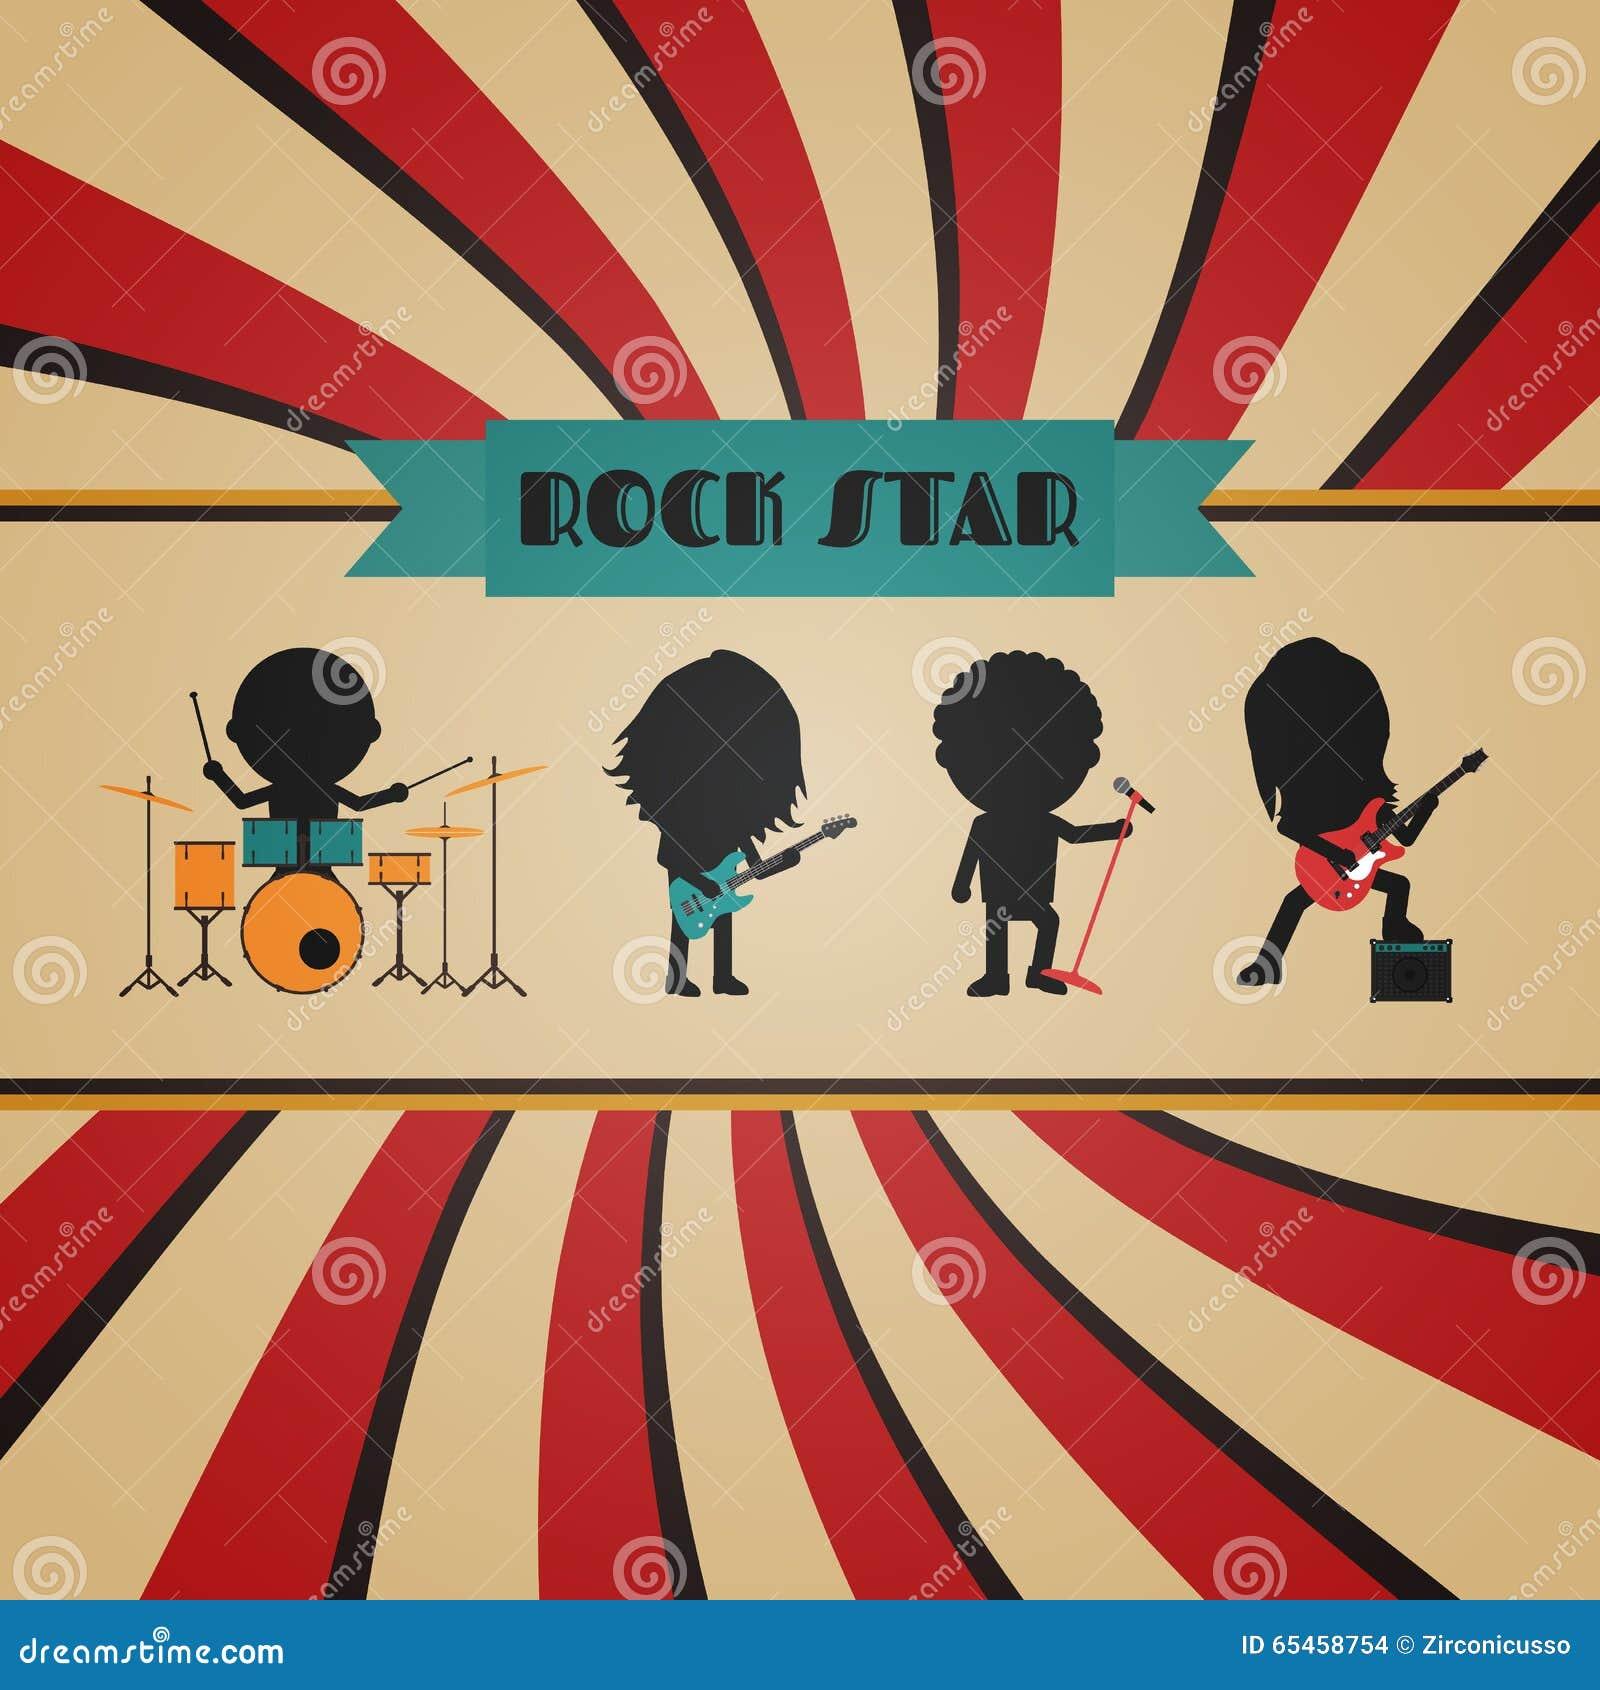 Retro Rock Poster Stock Vector Illustration Of Amplifier